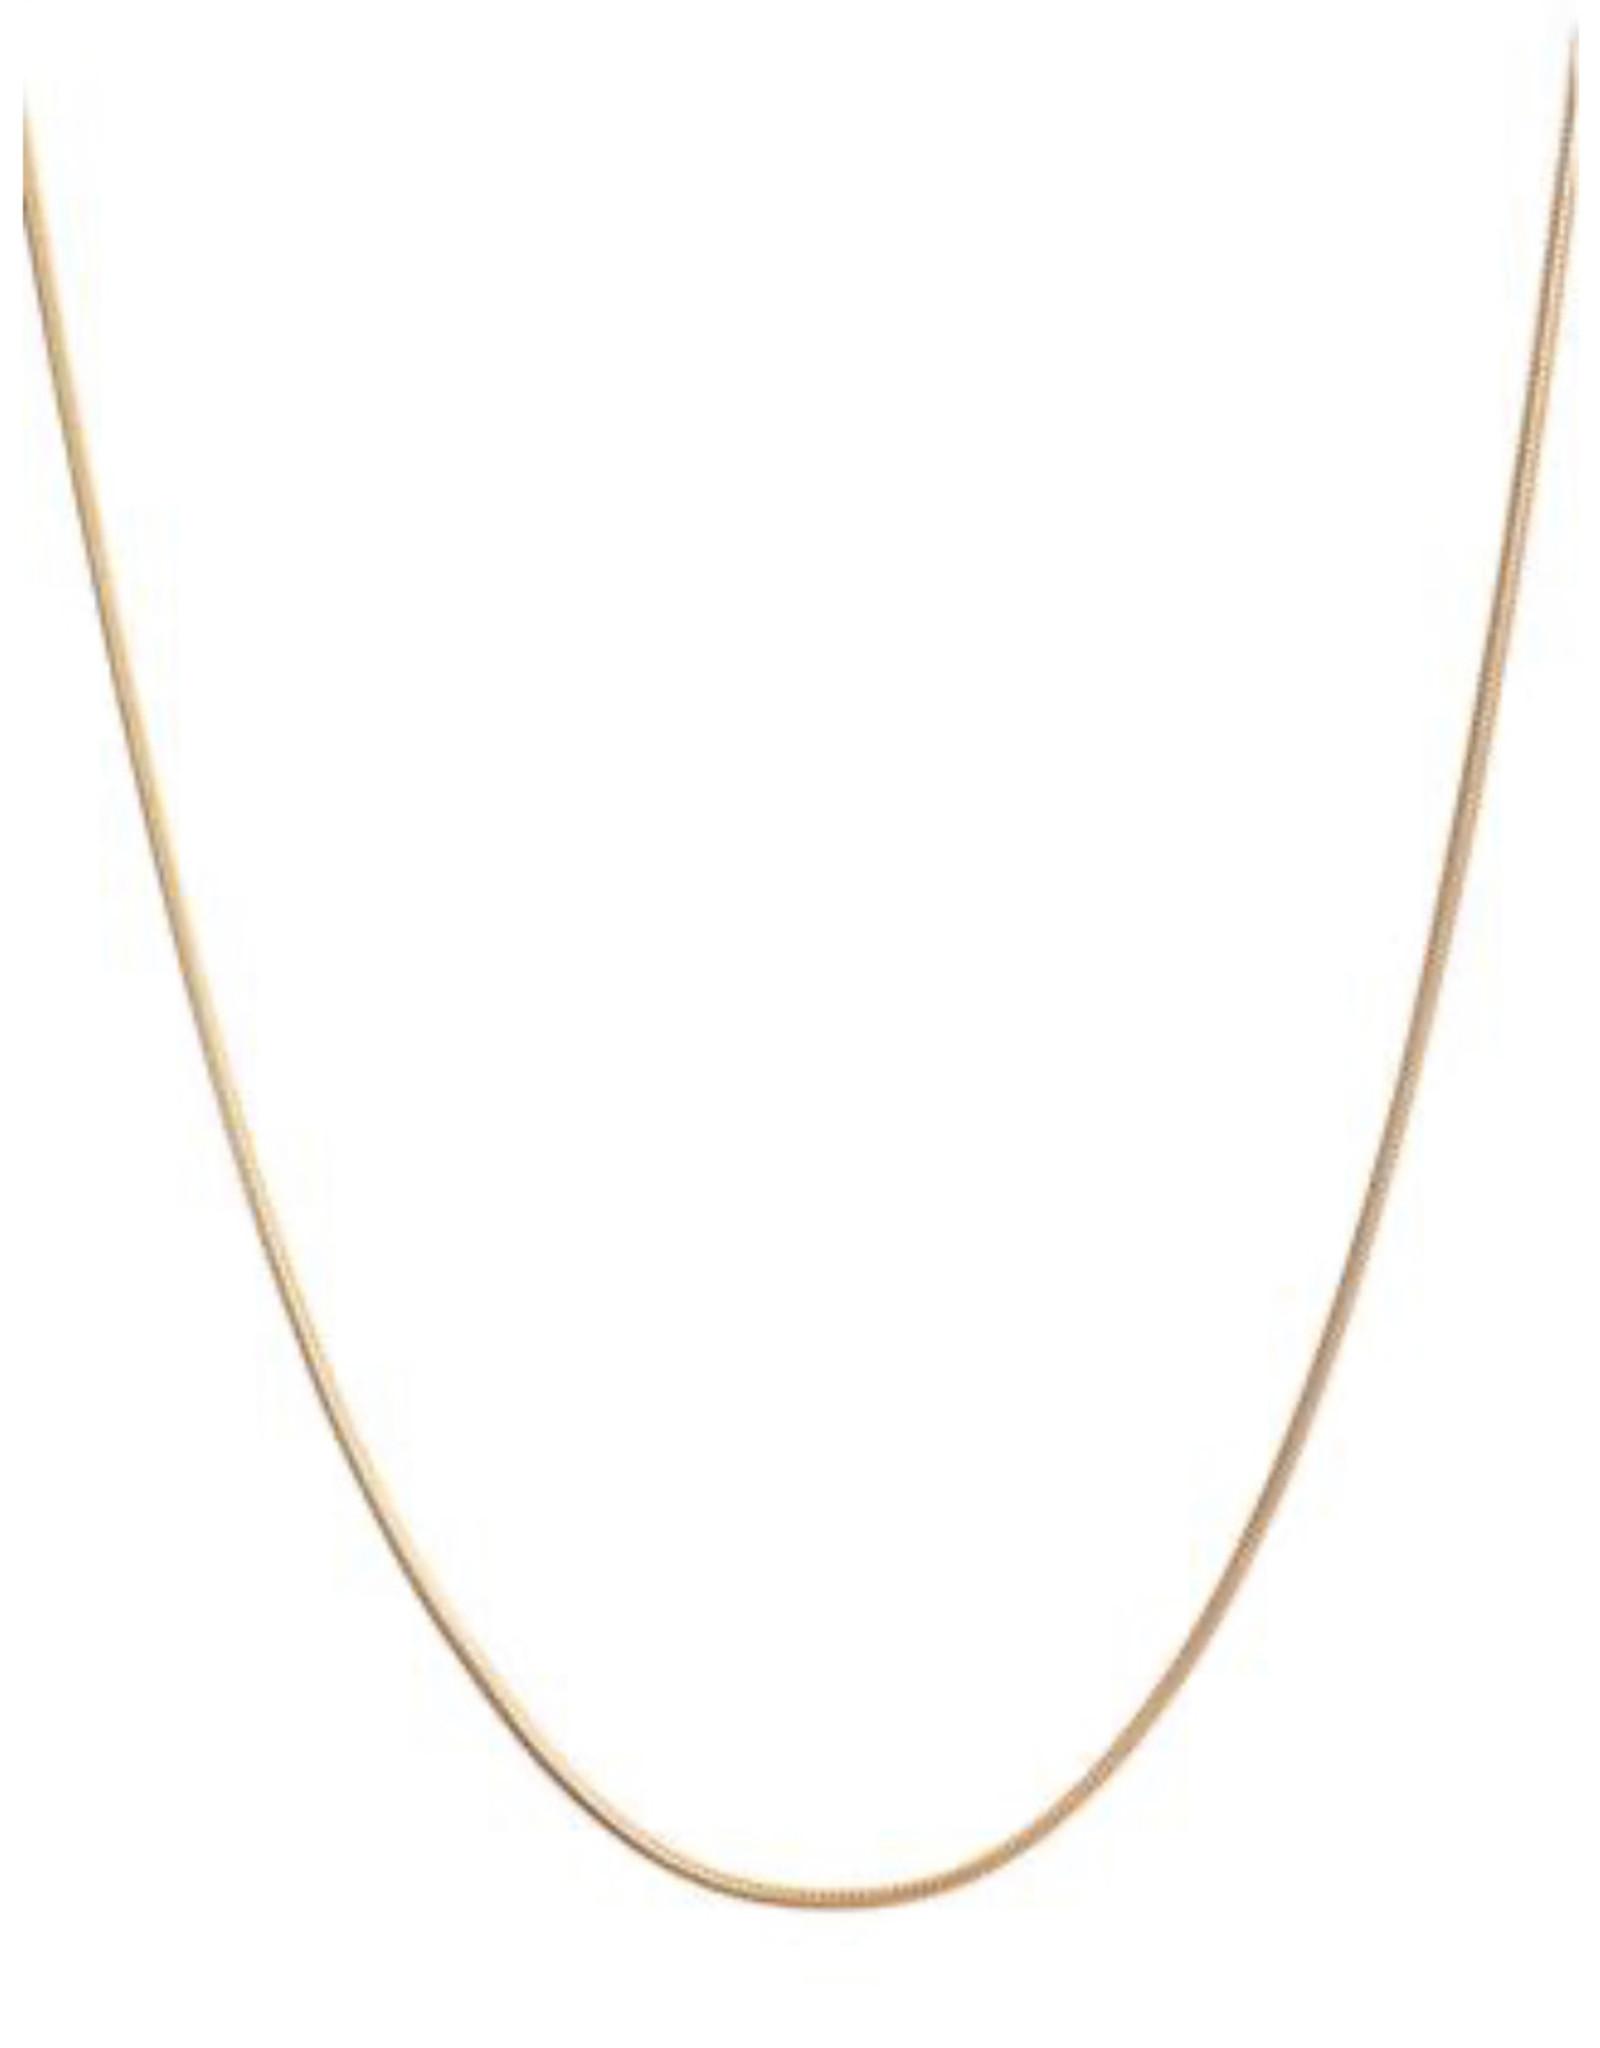 Lisbeth DARIA 14k Gold Fill Chain Necklace